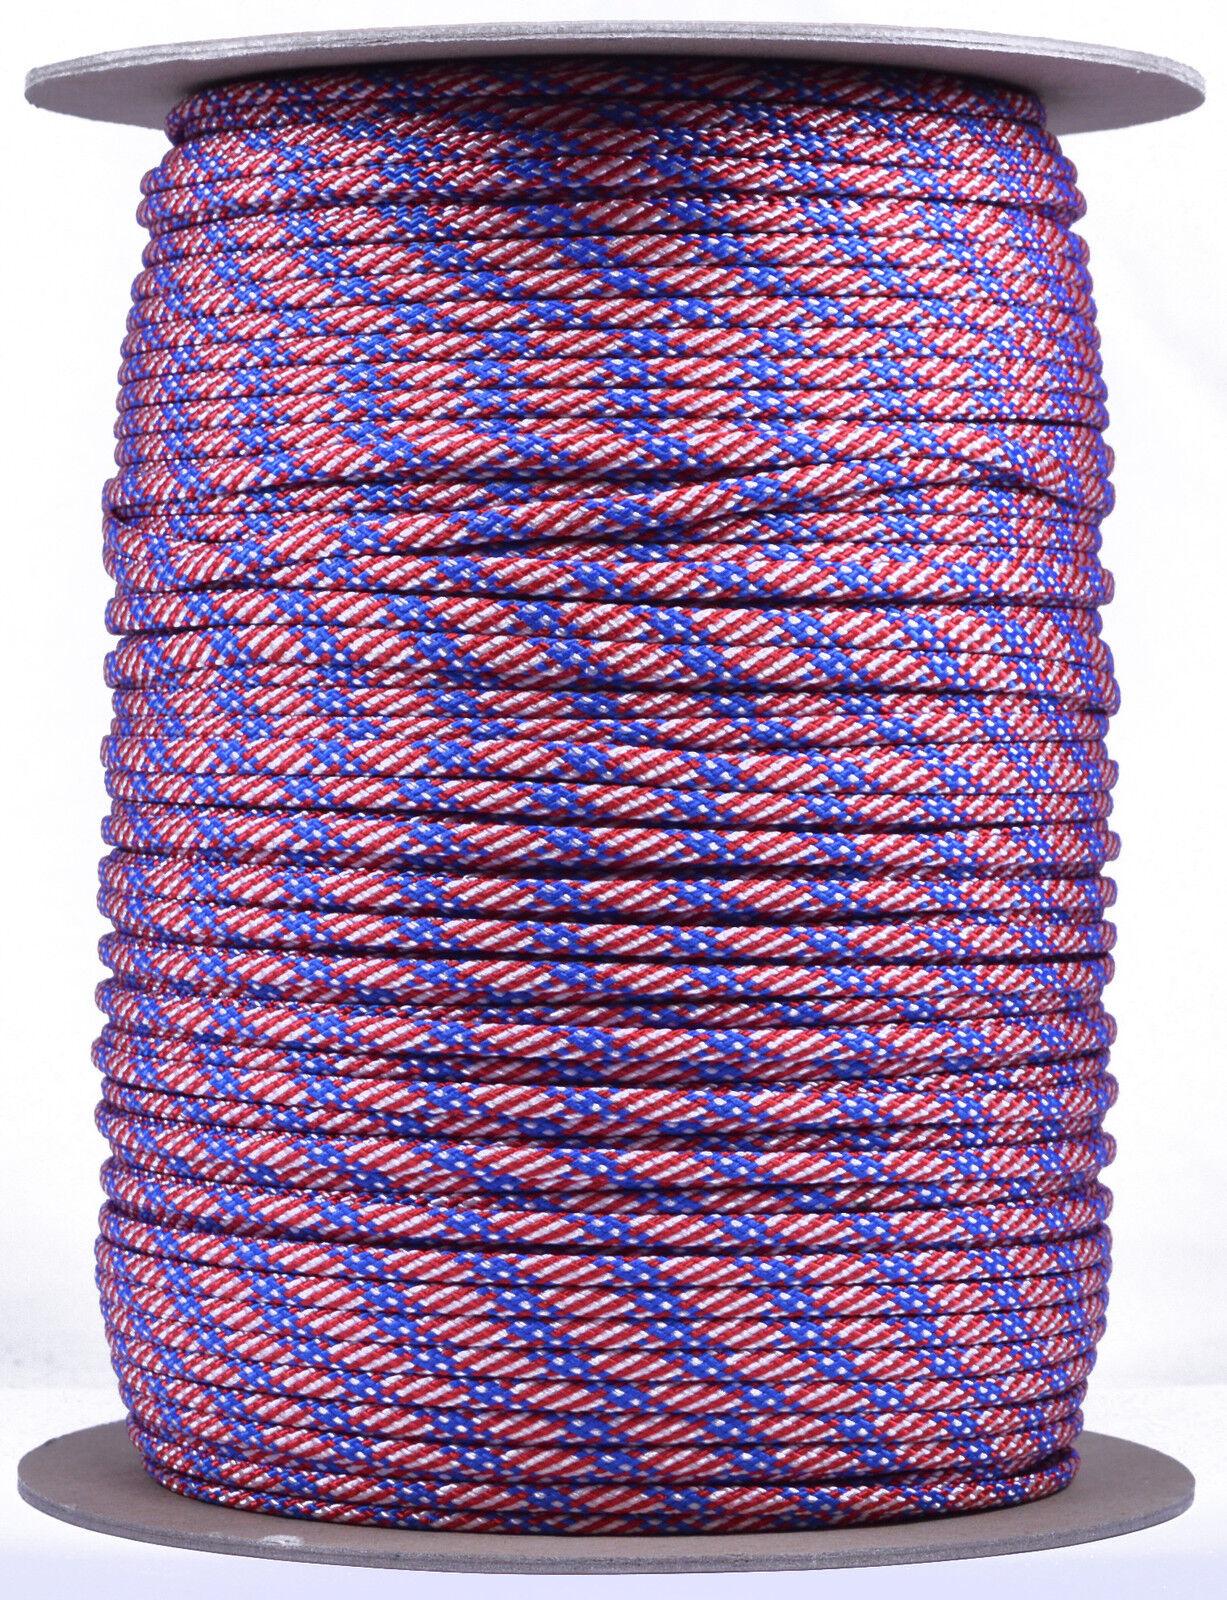 Stars & Stripes - 550 Paracord Rope 7 strand Parachute Cord - 1000 Foot Spool